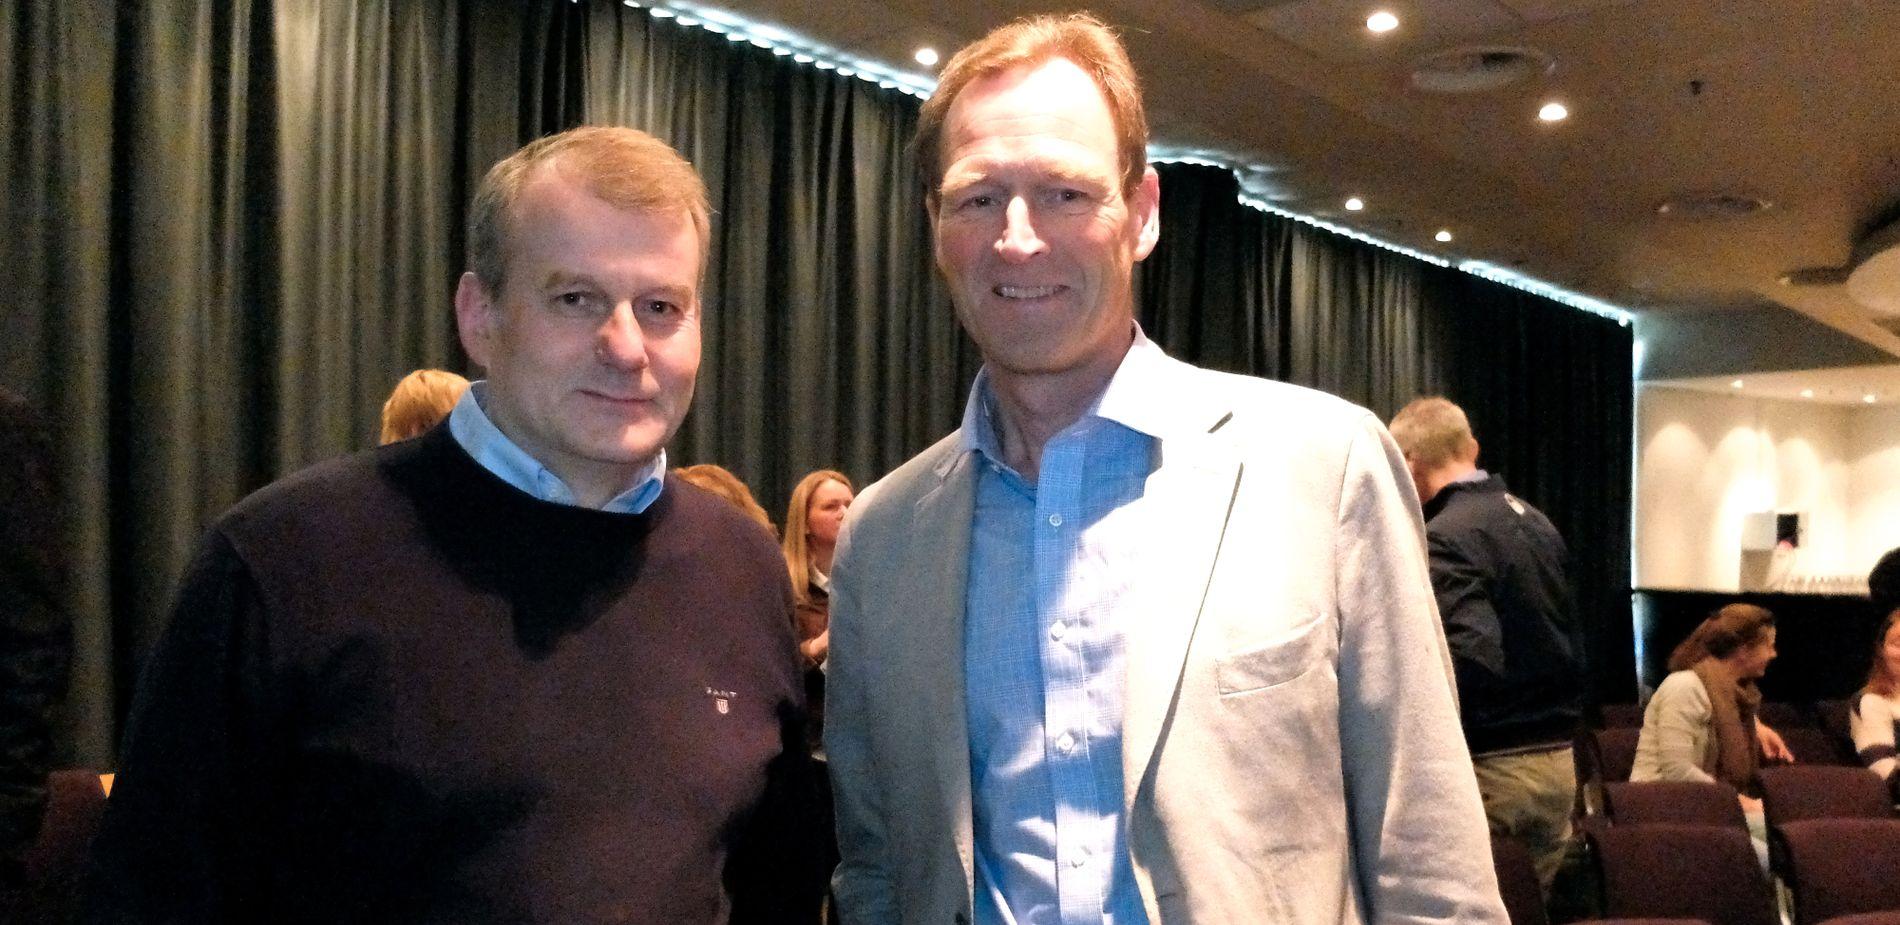 Erik Røste og Stein Opsal